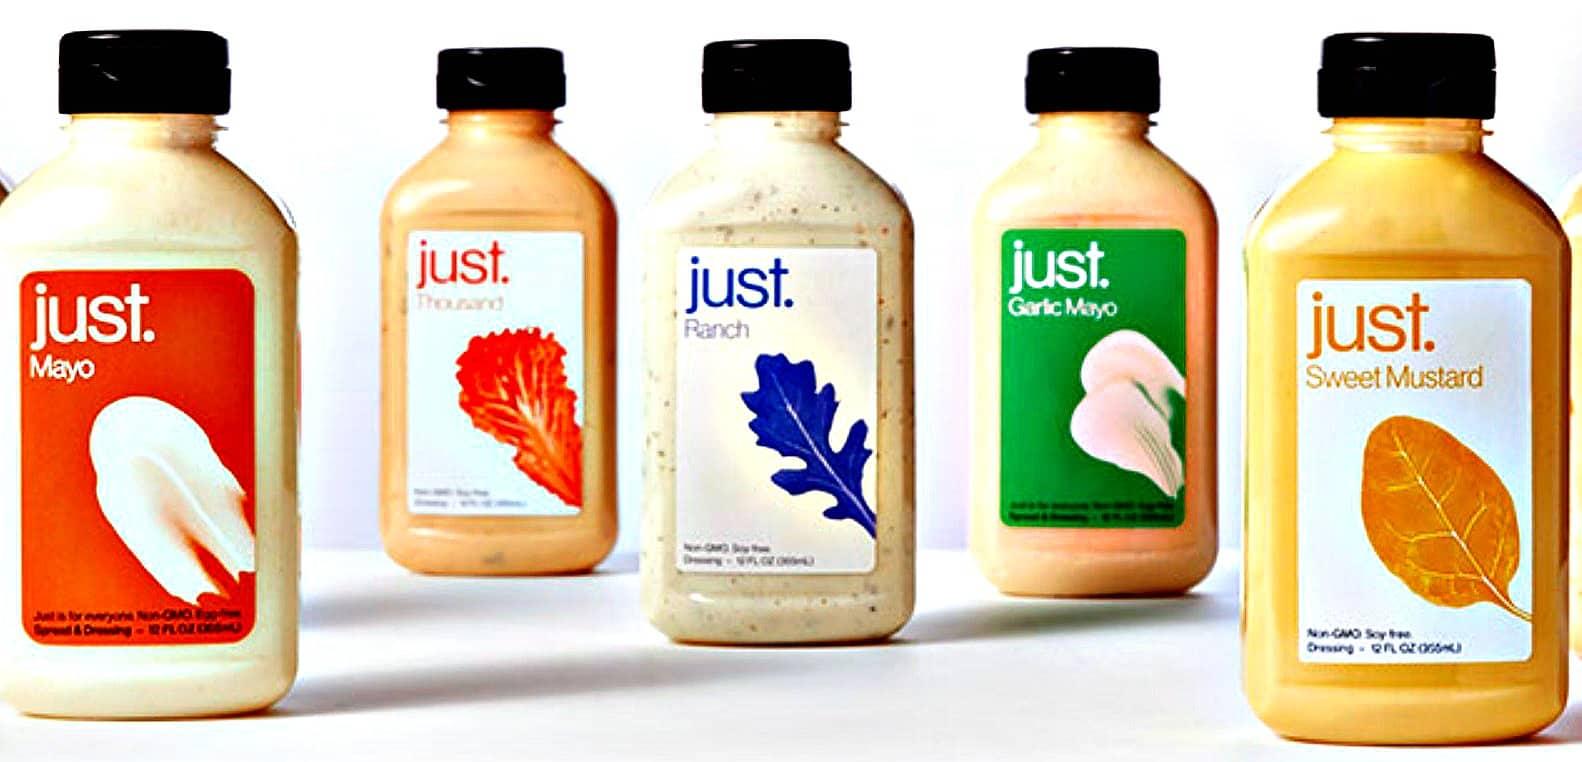 Josh Tetrick's JUST product line of vegan mayo & dressings - Swoon Talent